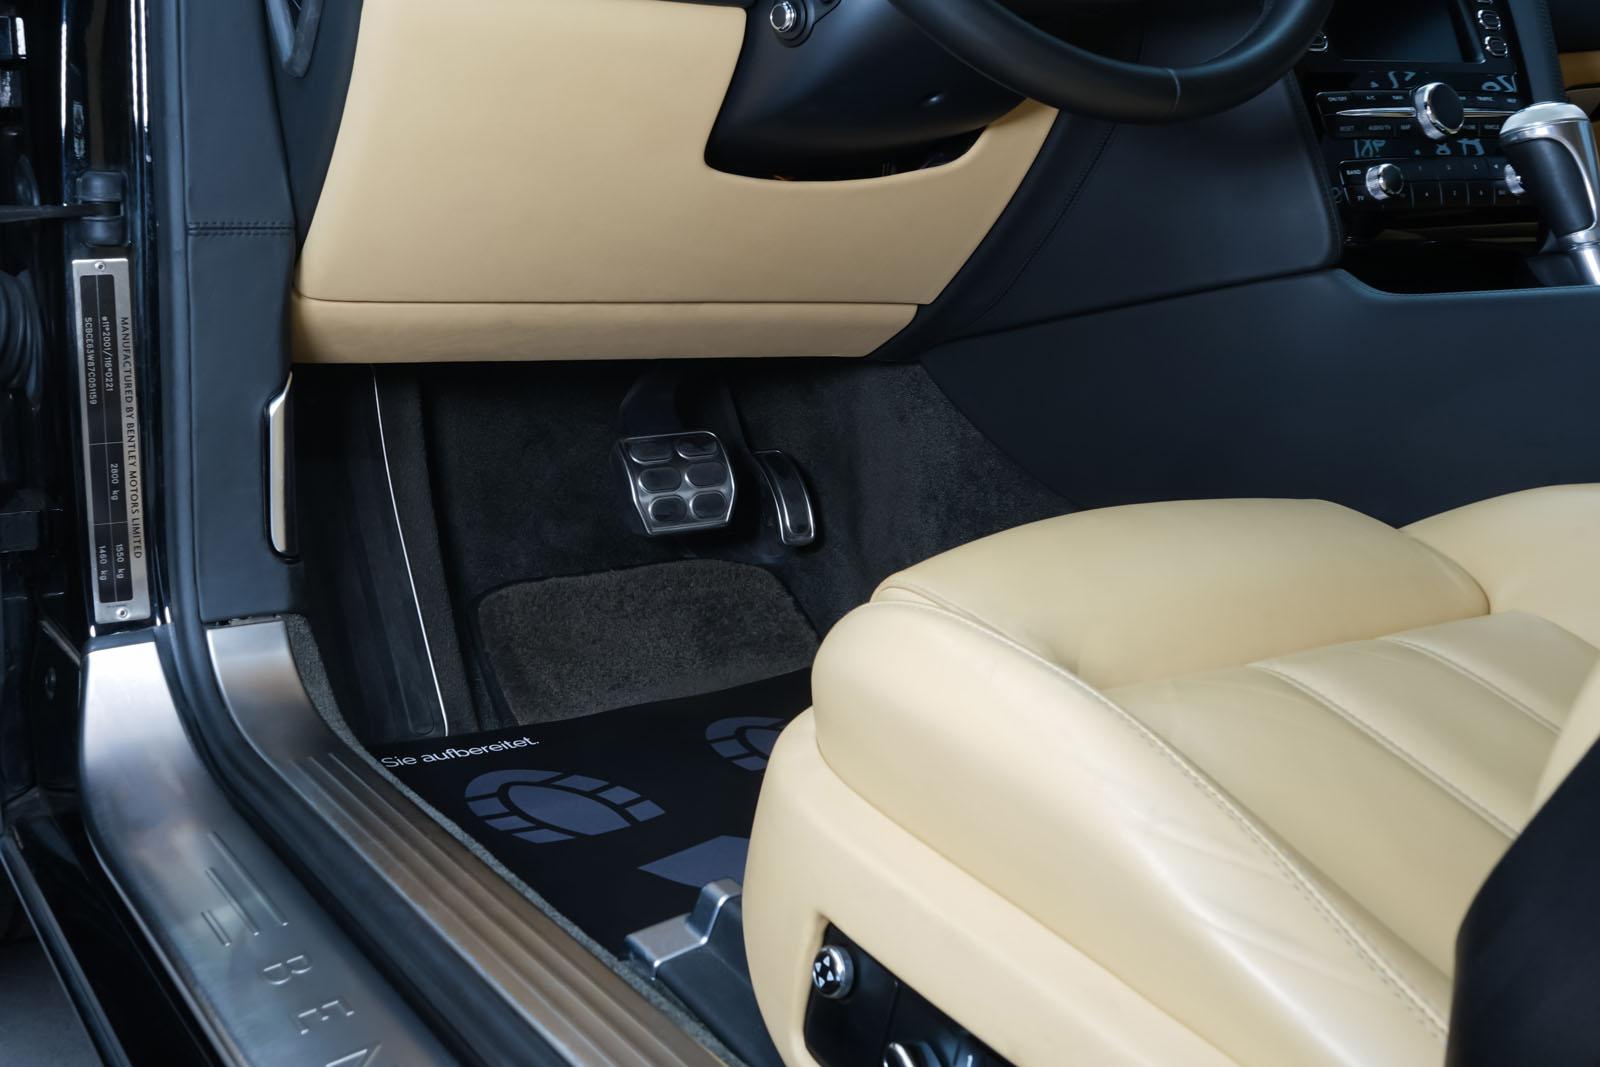 Bentley_Continental_GT_Schwarz_Beige_BEN-1159_7_w